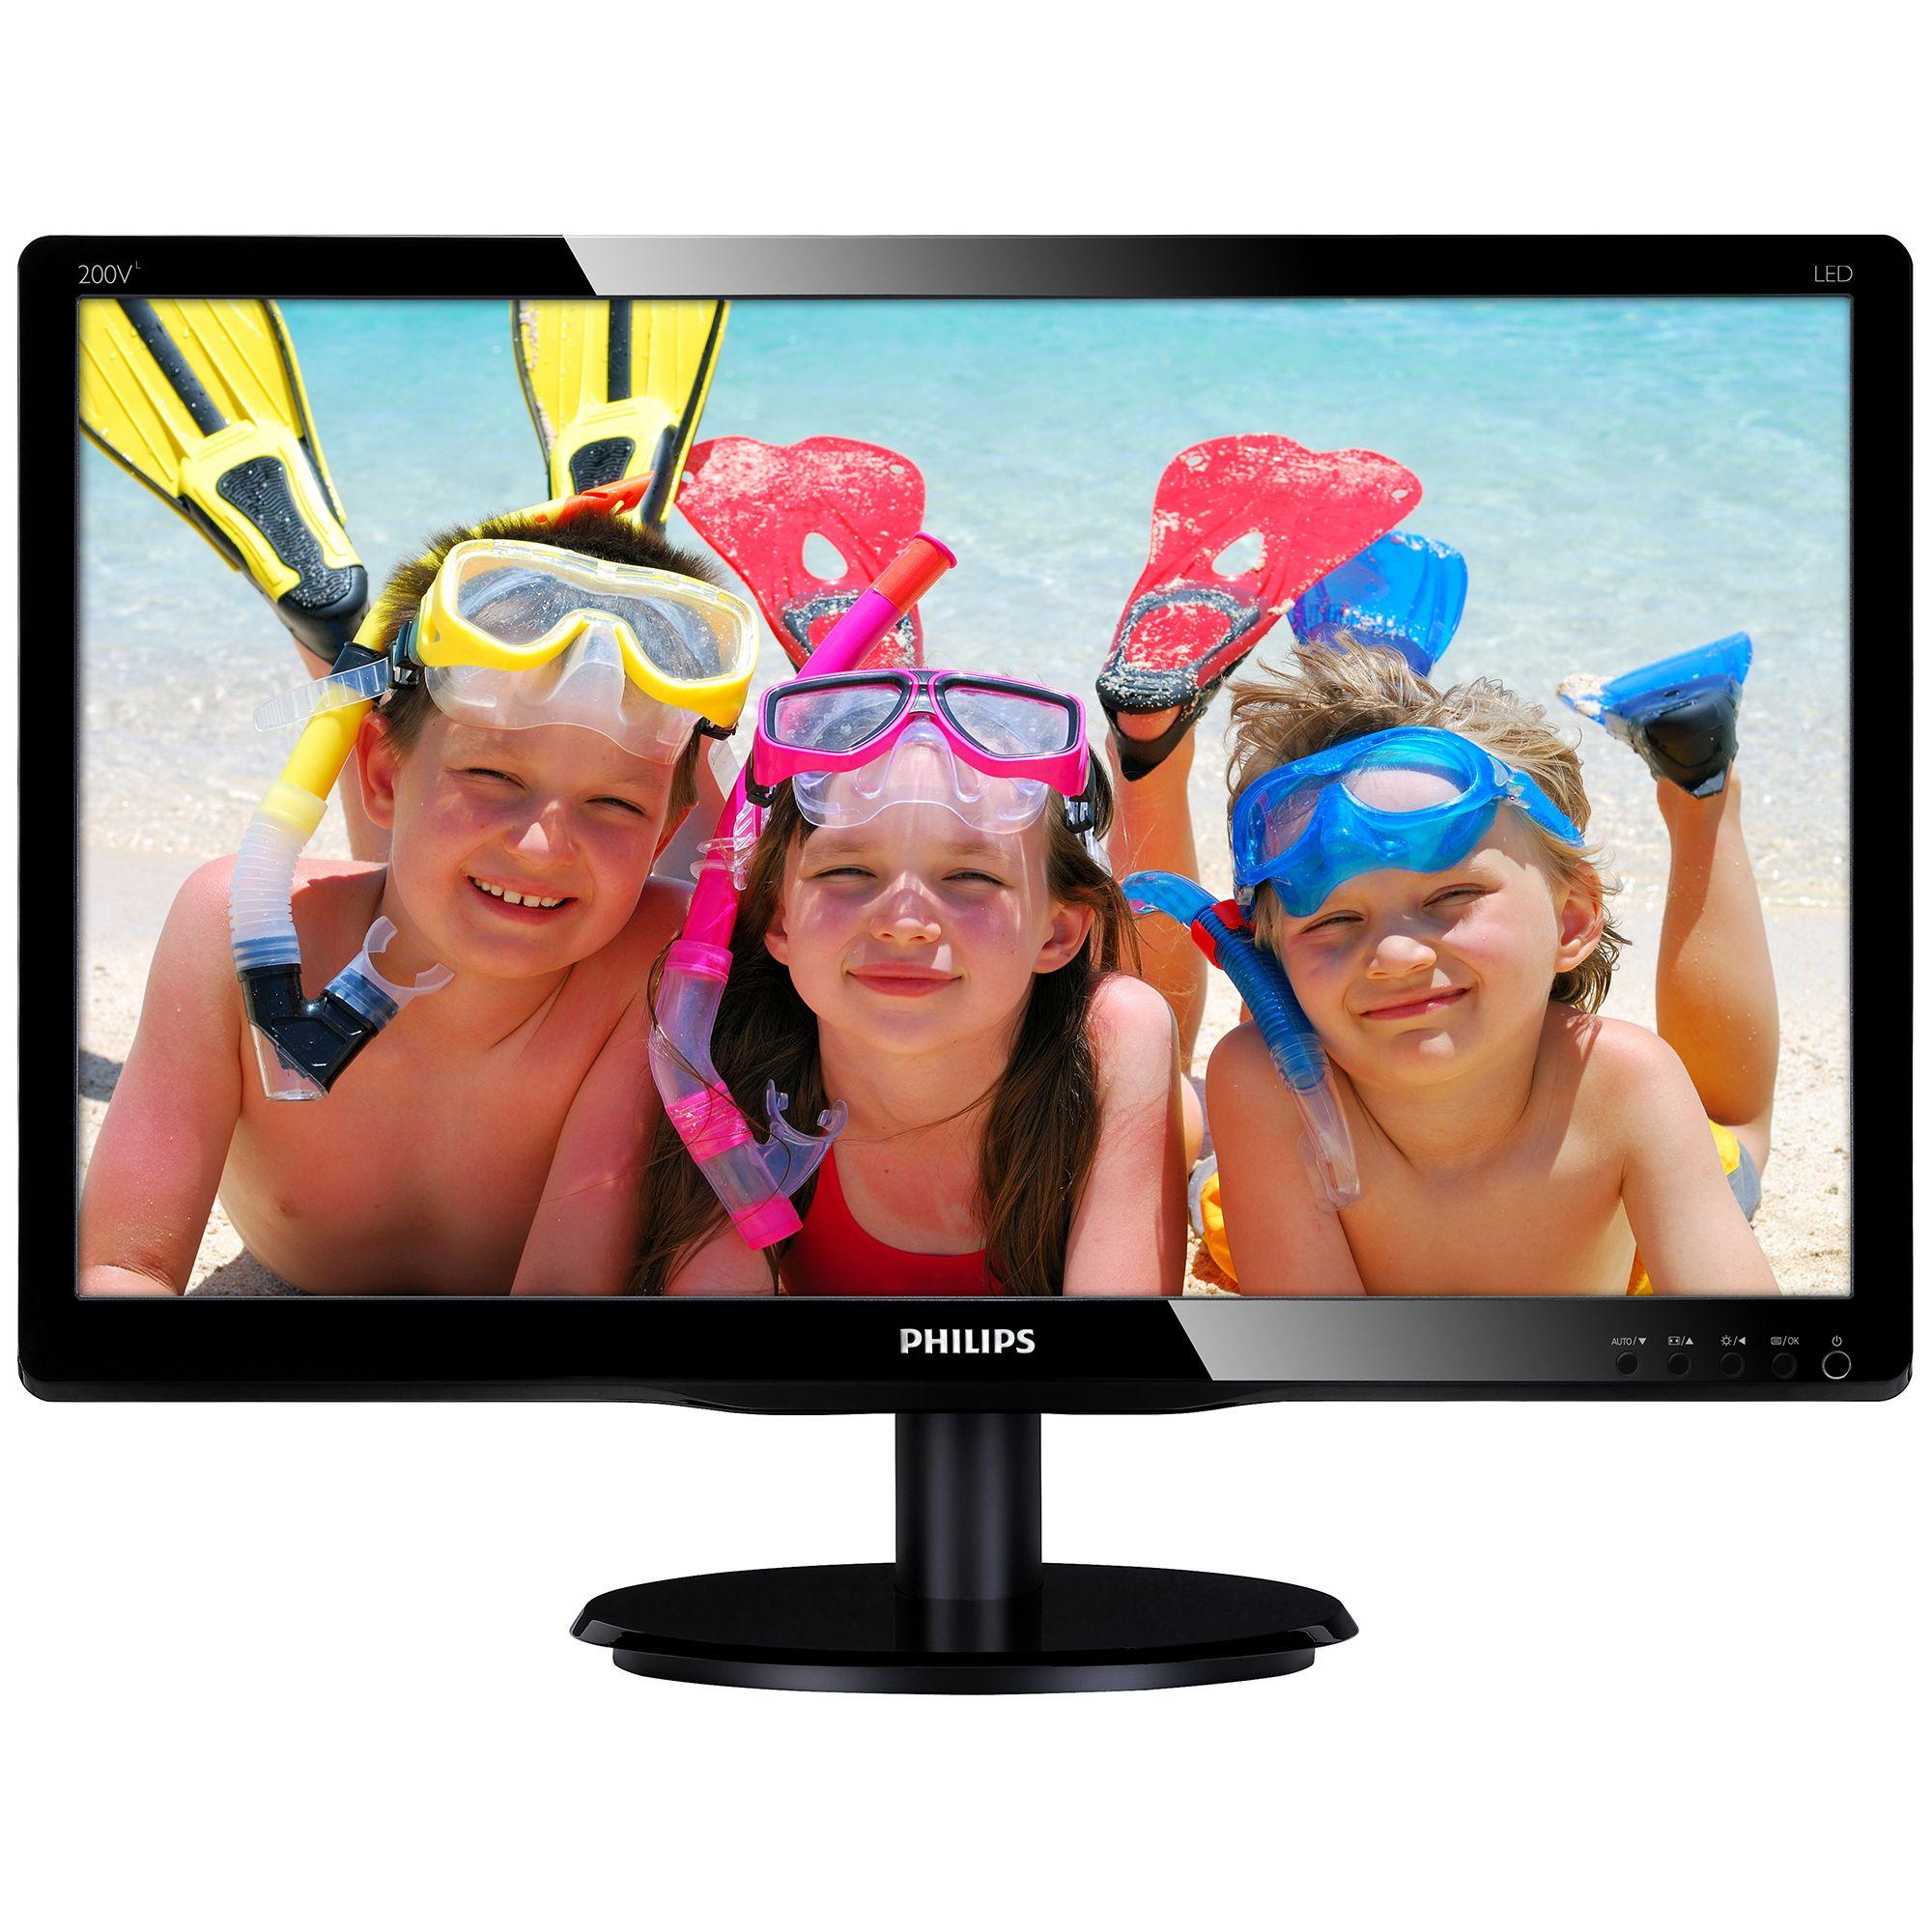 Monitor LED Philips V-line 200V4LAB2 19.5 5ms 16:9 D-Sub DVI Negru